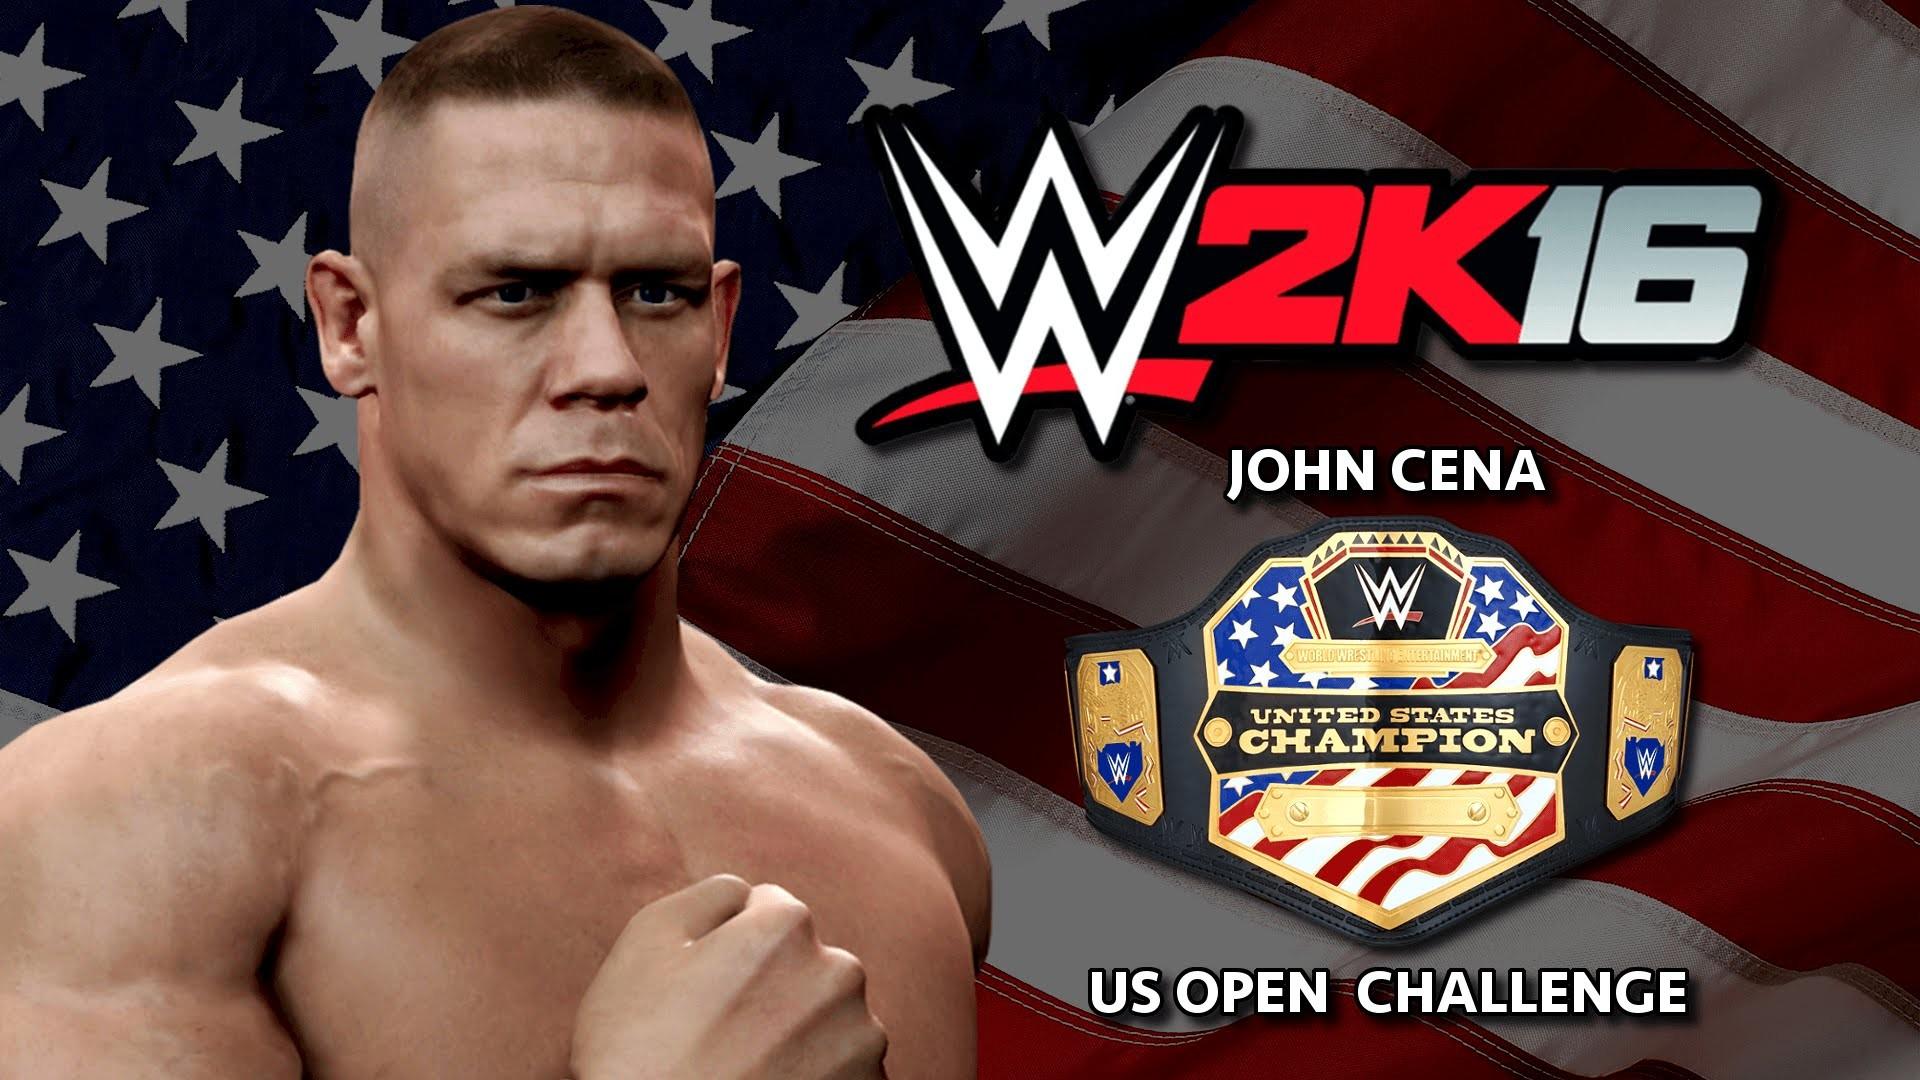 WWE 2K16 John Cena U.S Open Challenge Teaser Trailer (Concept)